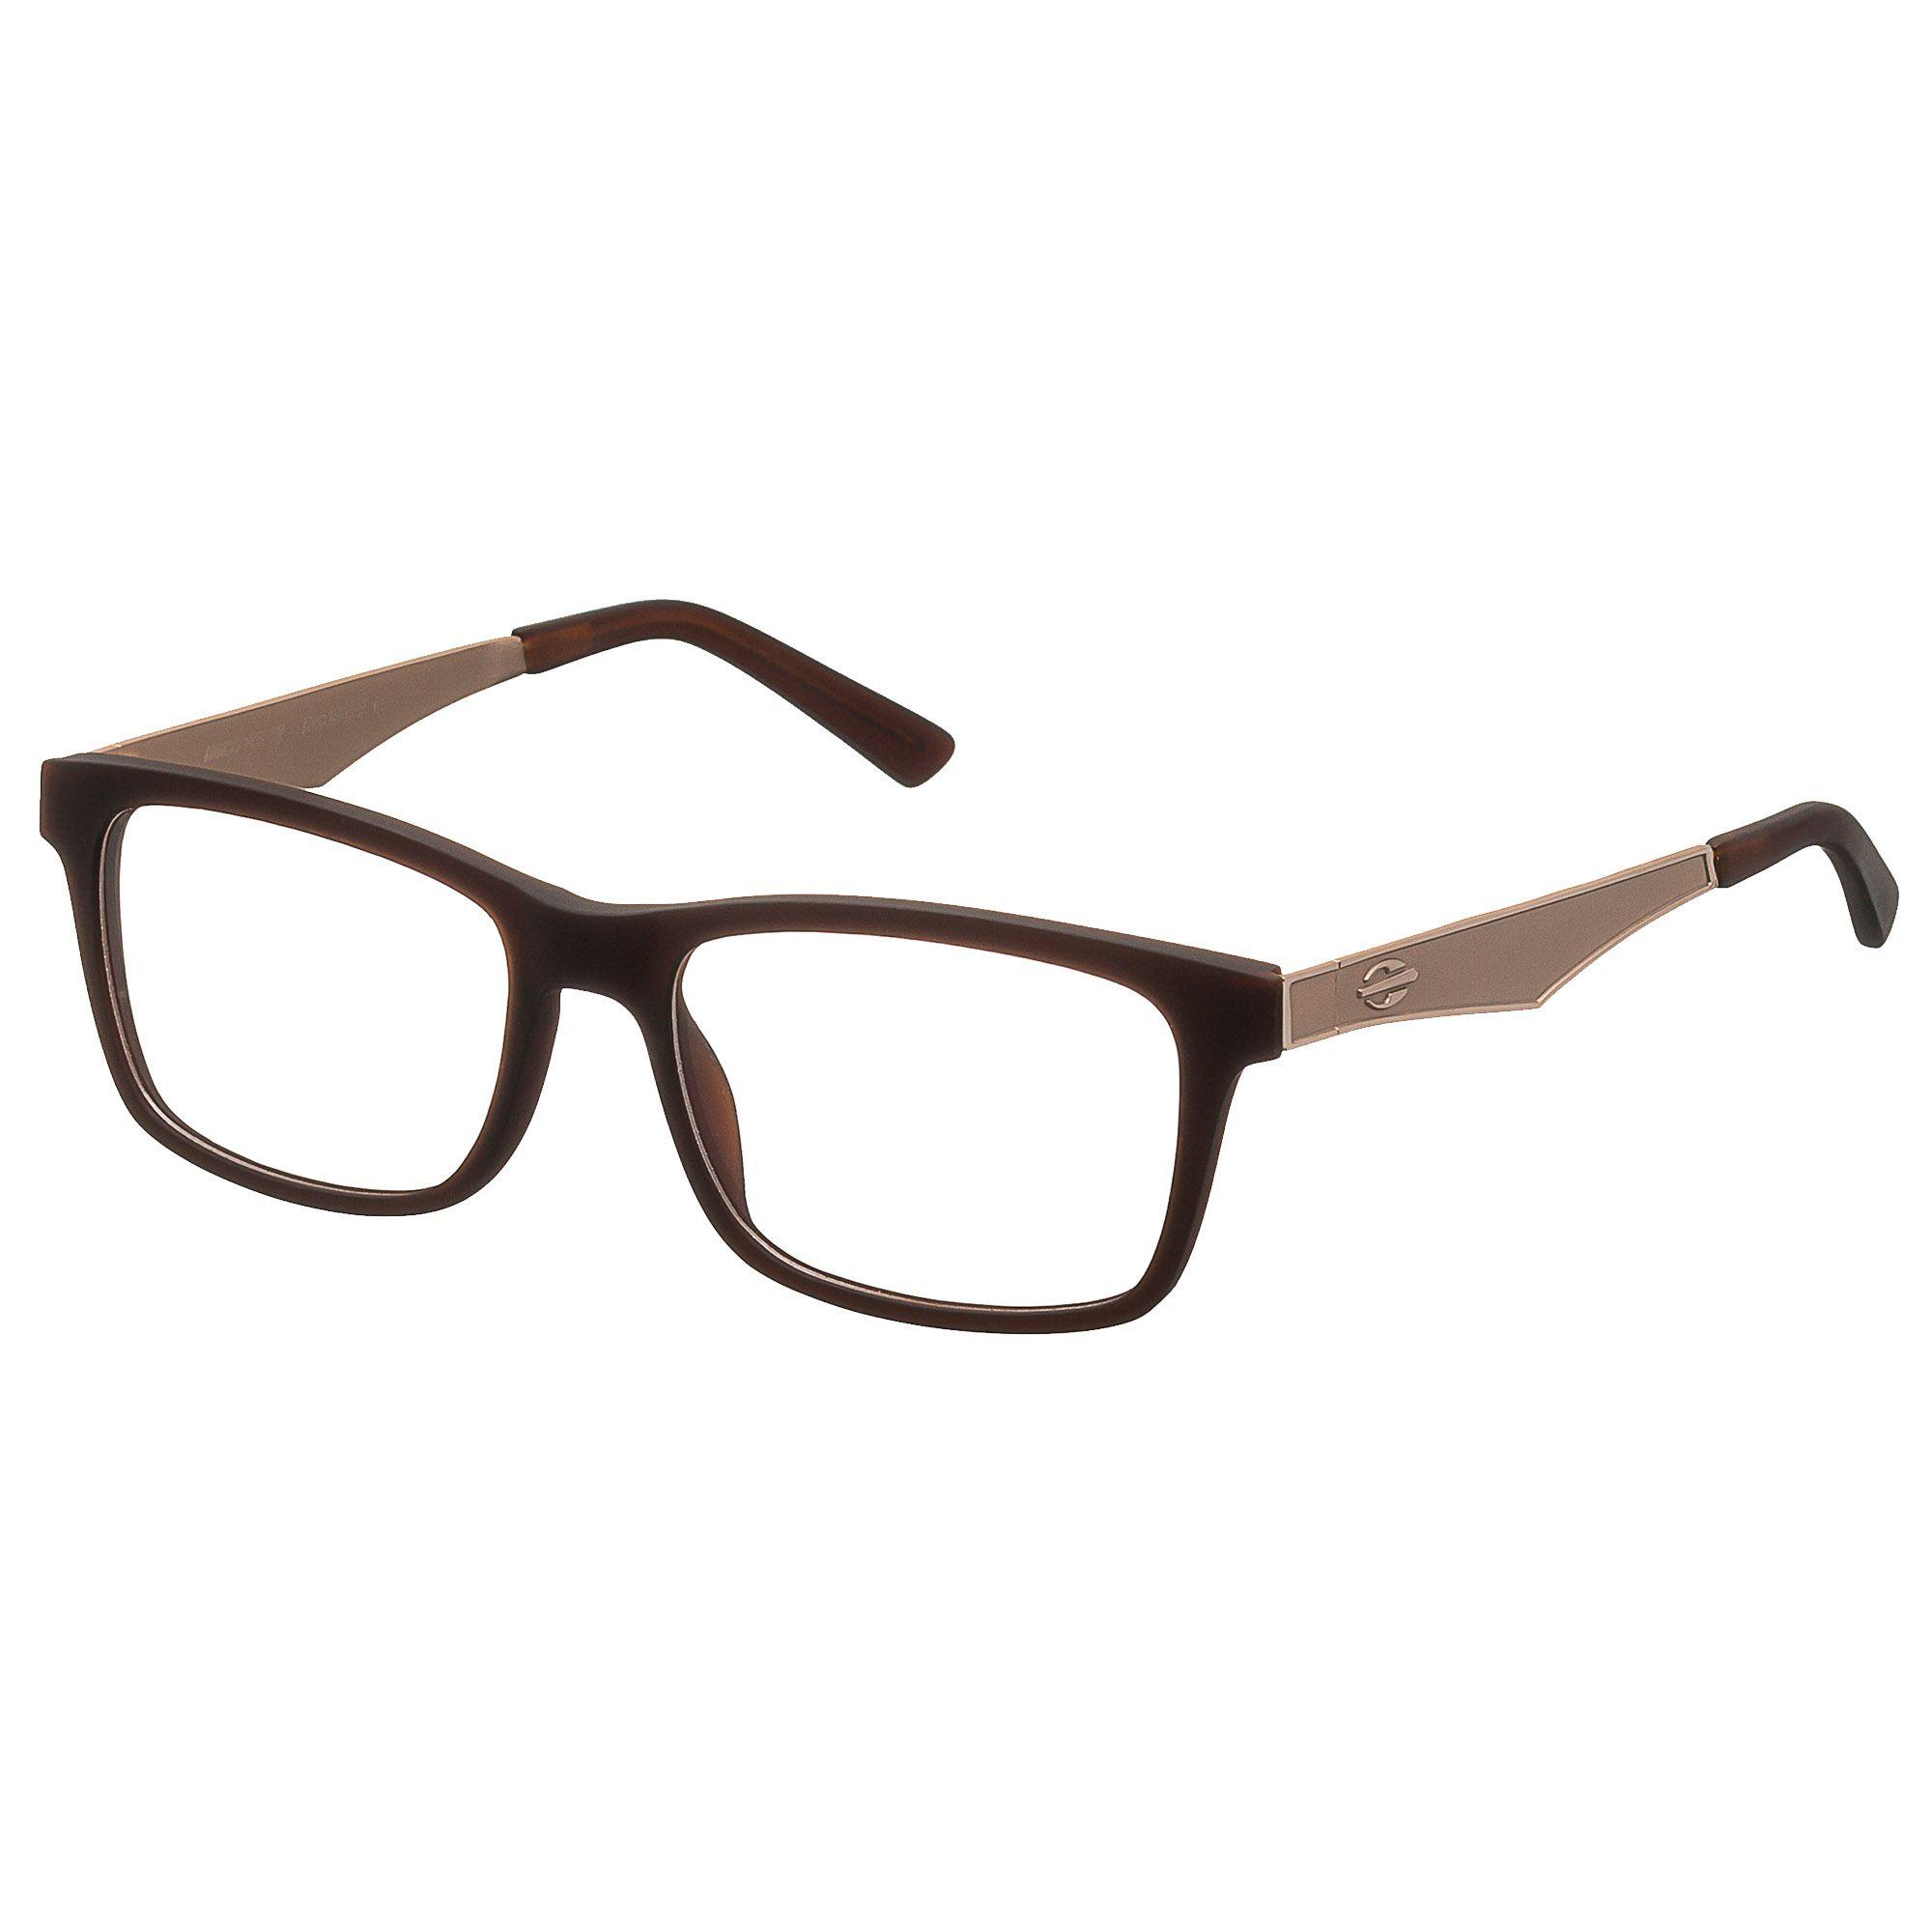 Óculos de Grau Unissex Mormaii M6100F0352